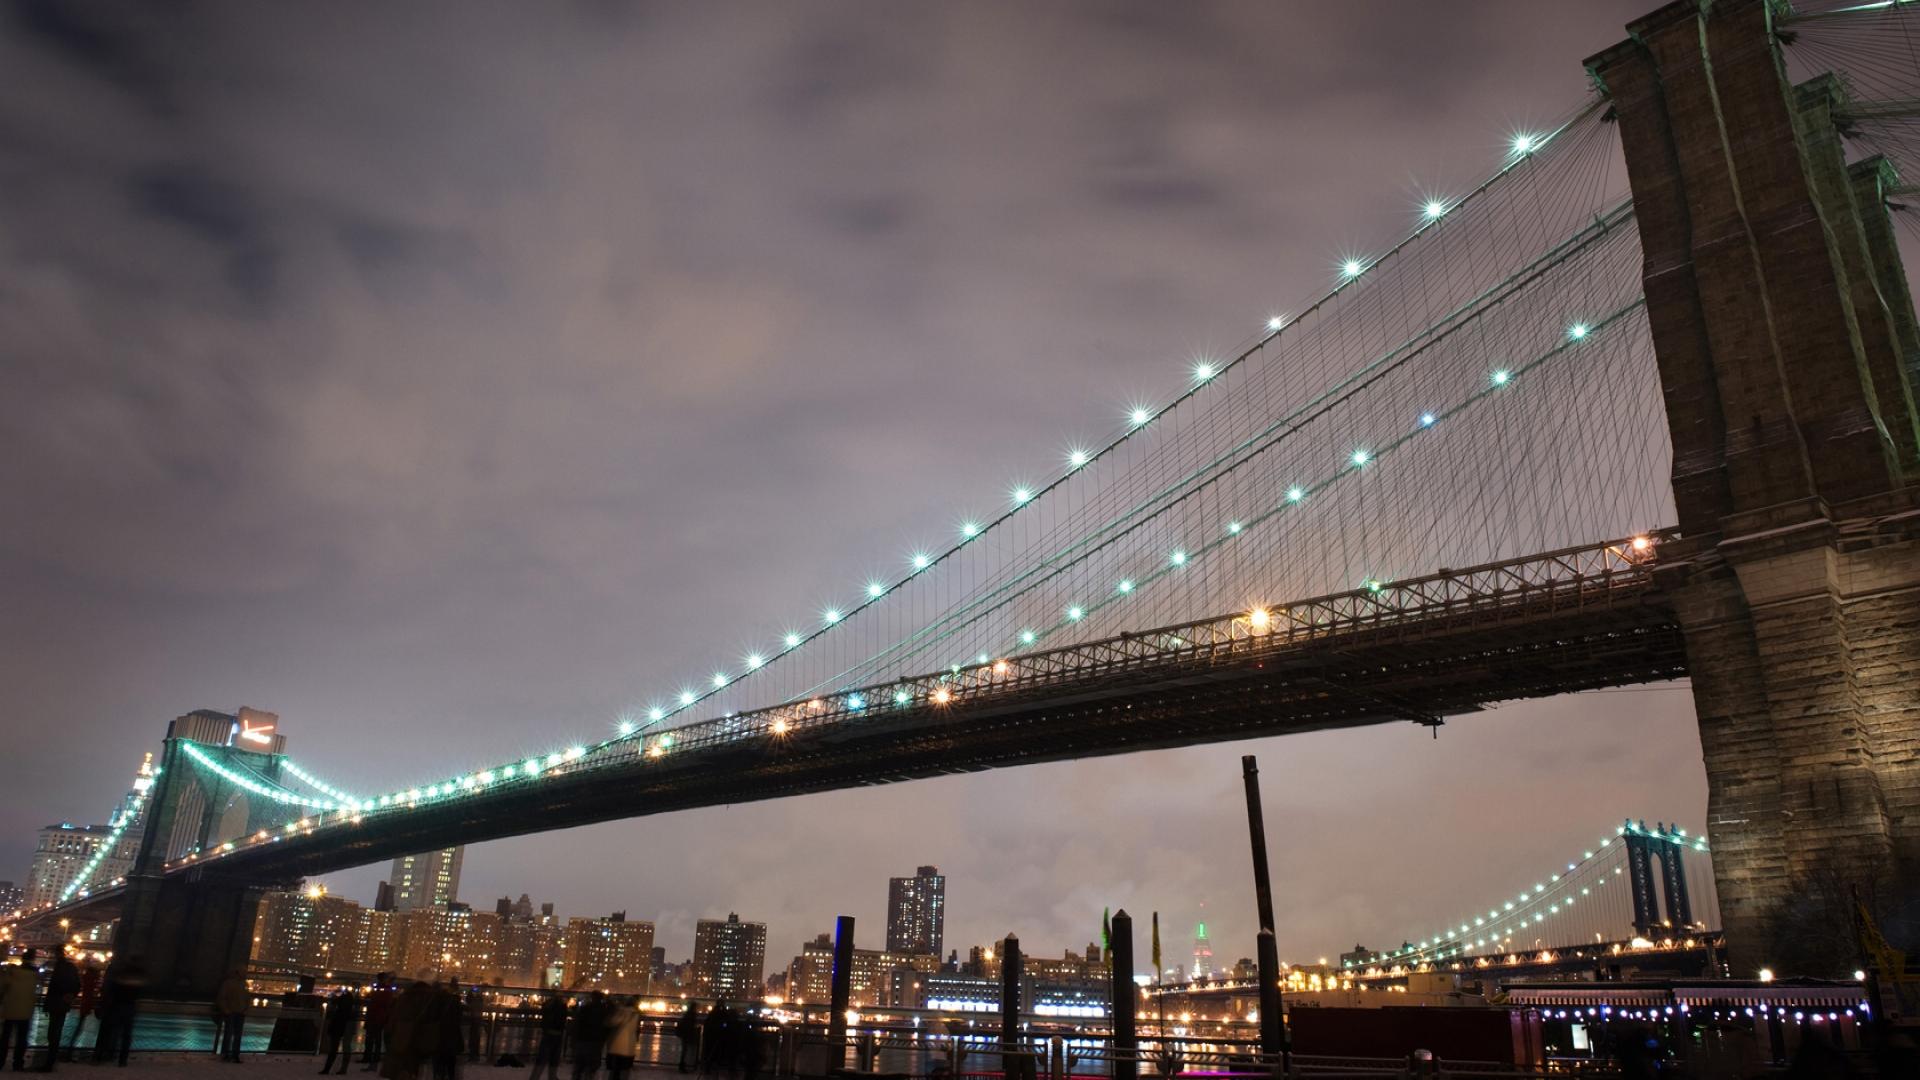 Brooklyn bridge wallpaper hd wallpapers - Bridge wallpaper hd ...